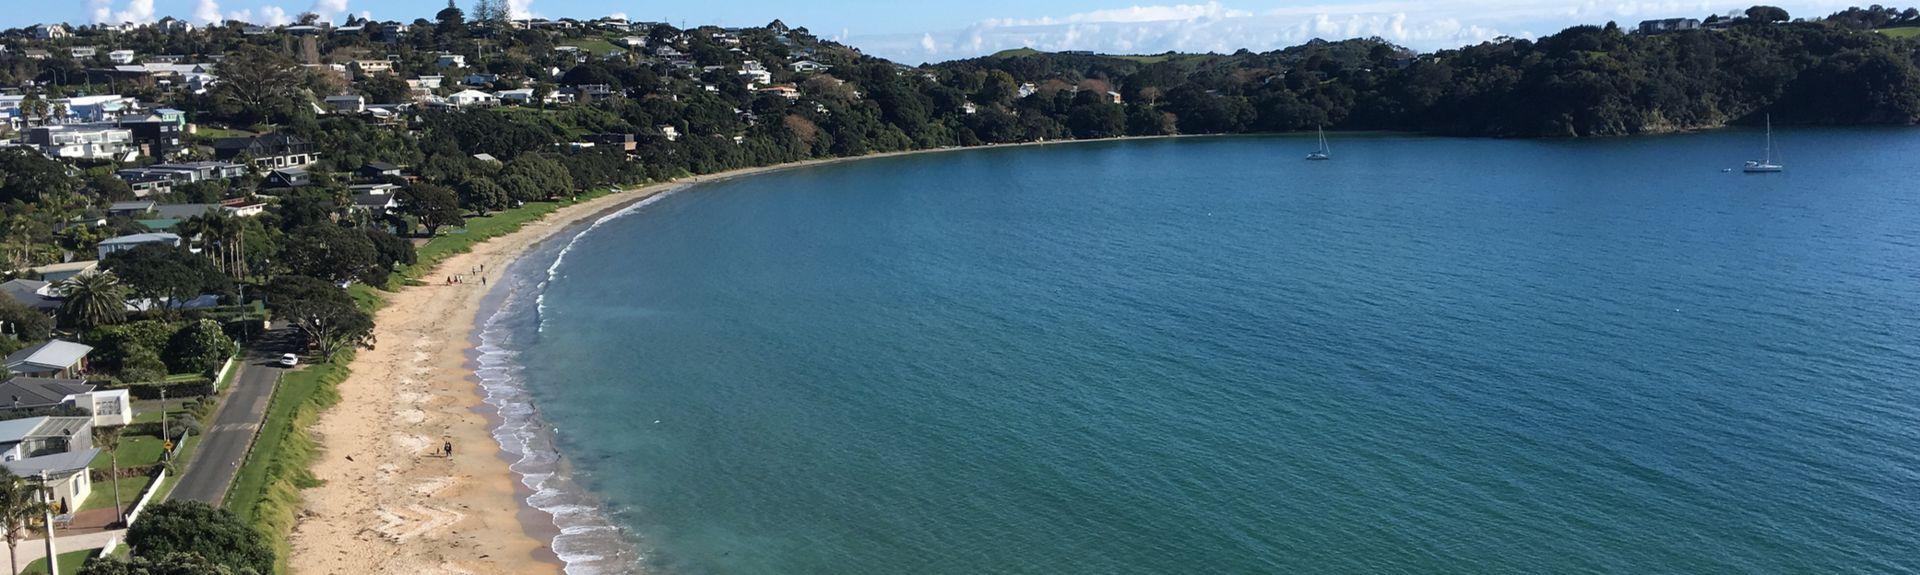 Palm Beach, Waiheke Island, Auckland, New Zealand